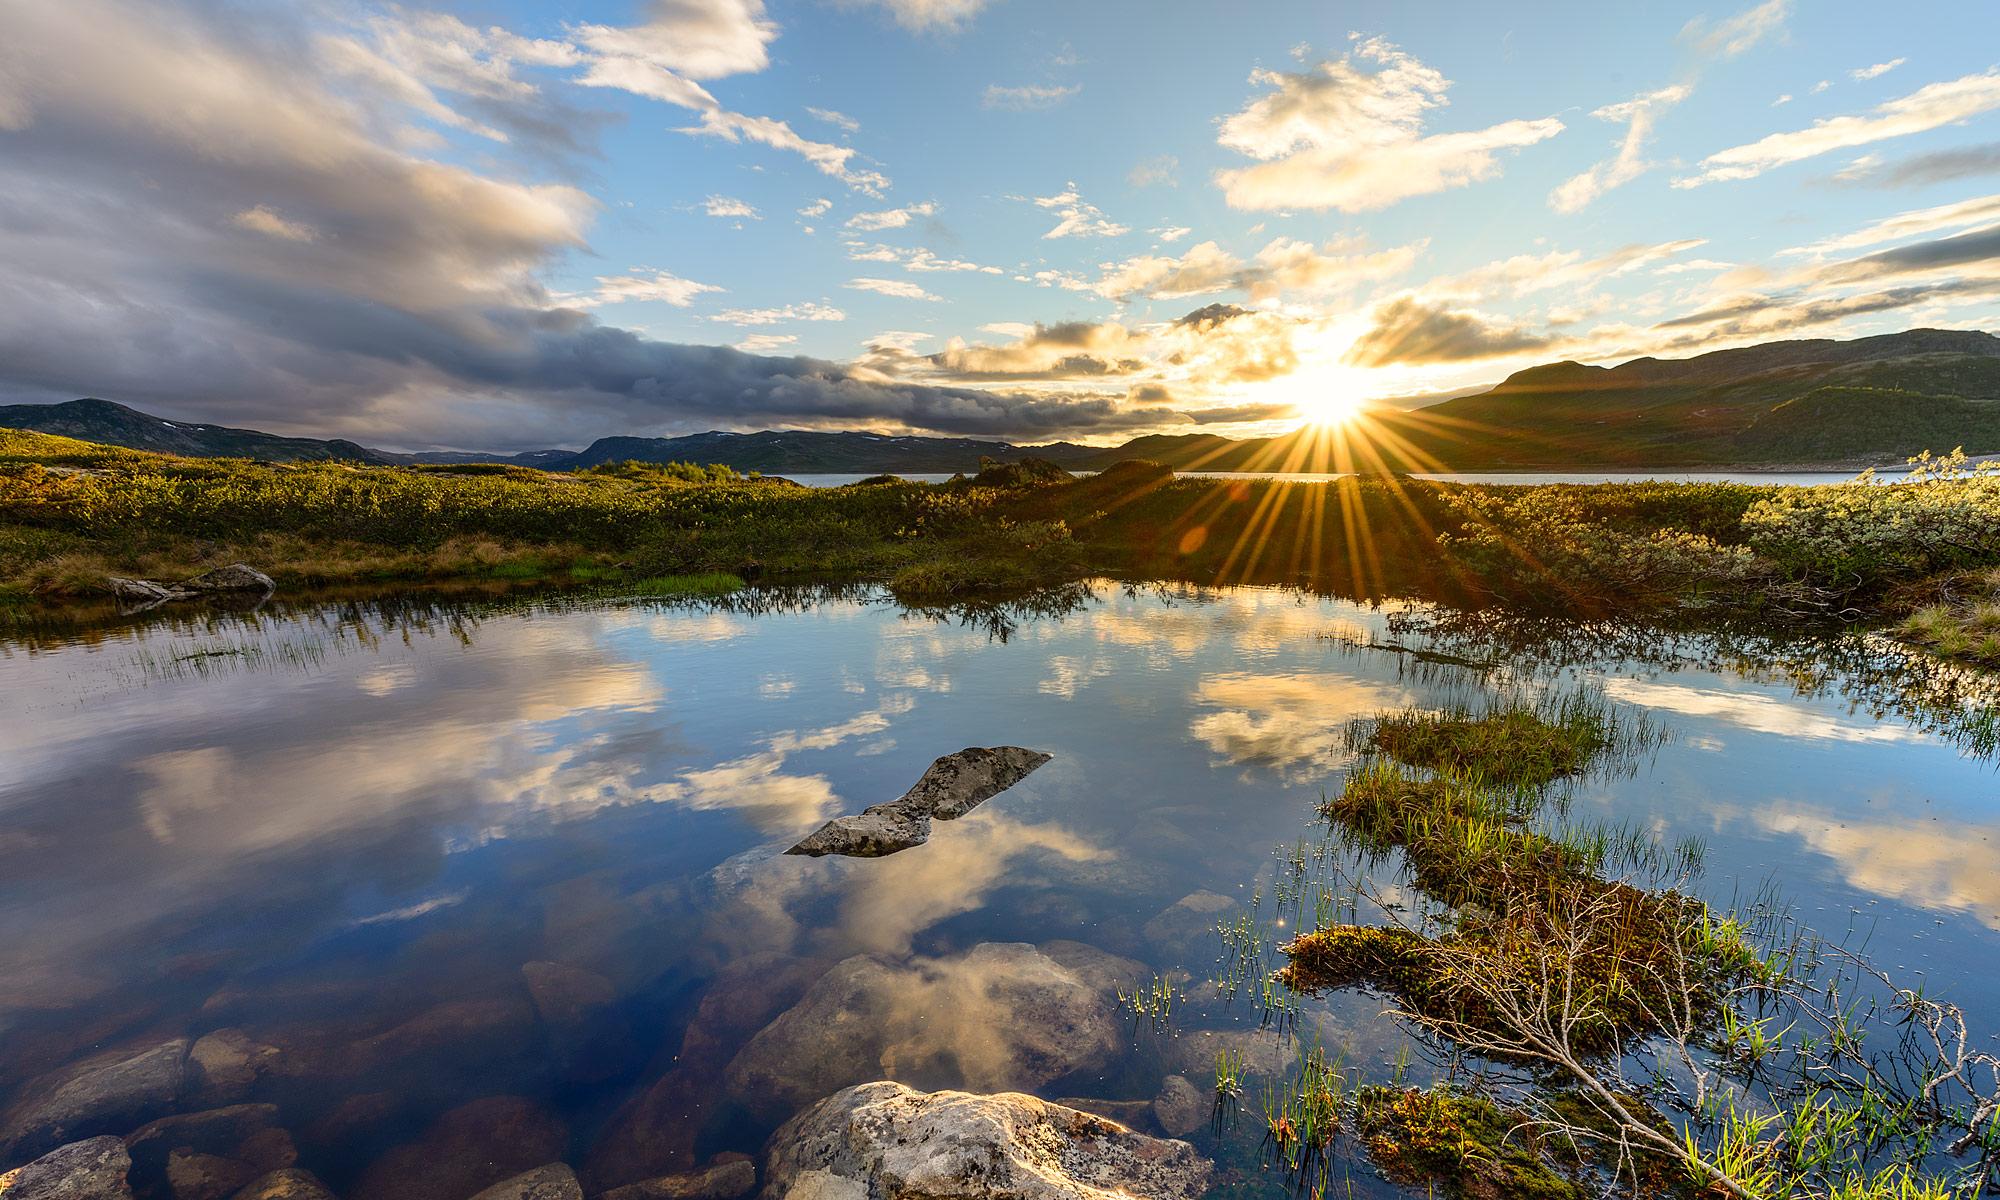 Sunset near Sønstevatn, Norway – Landscape Photography